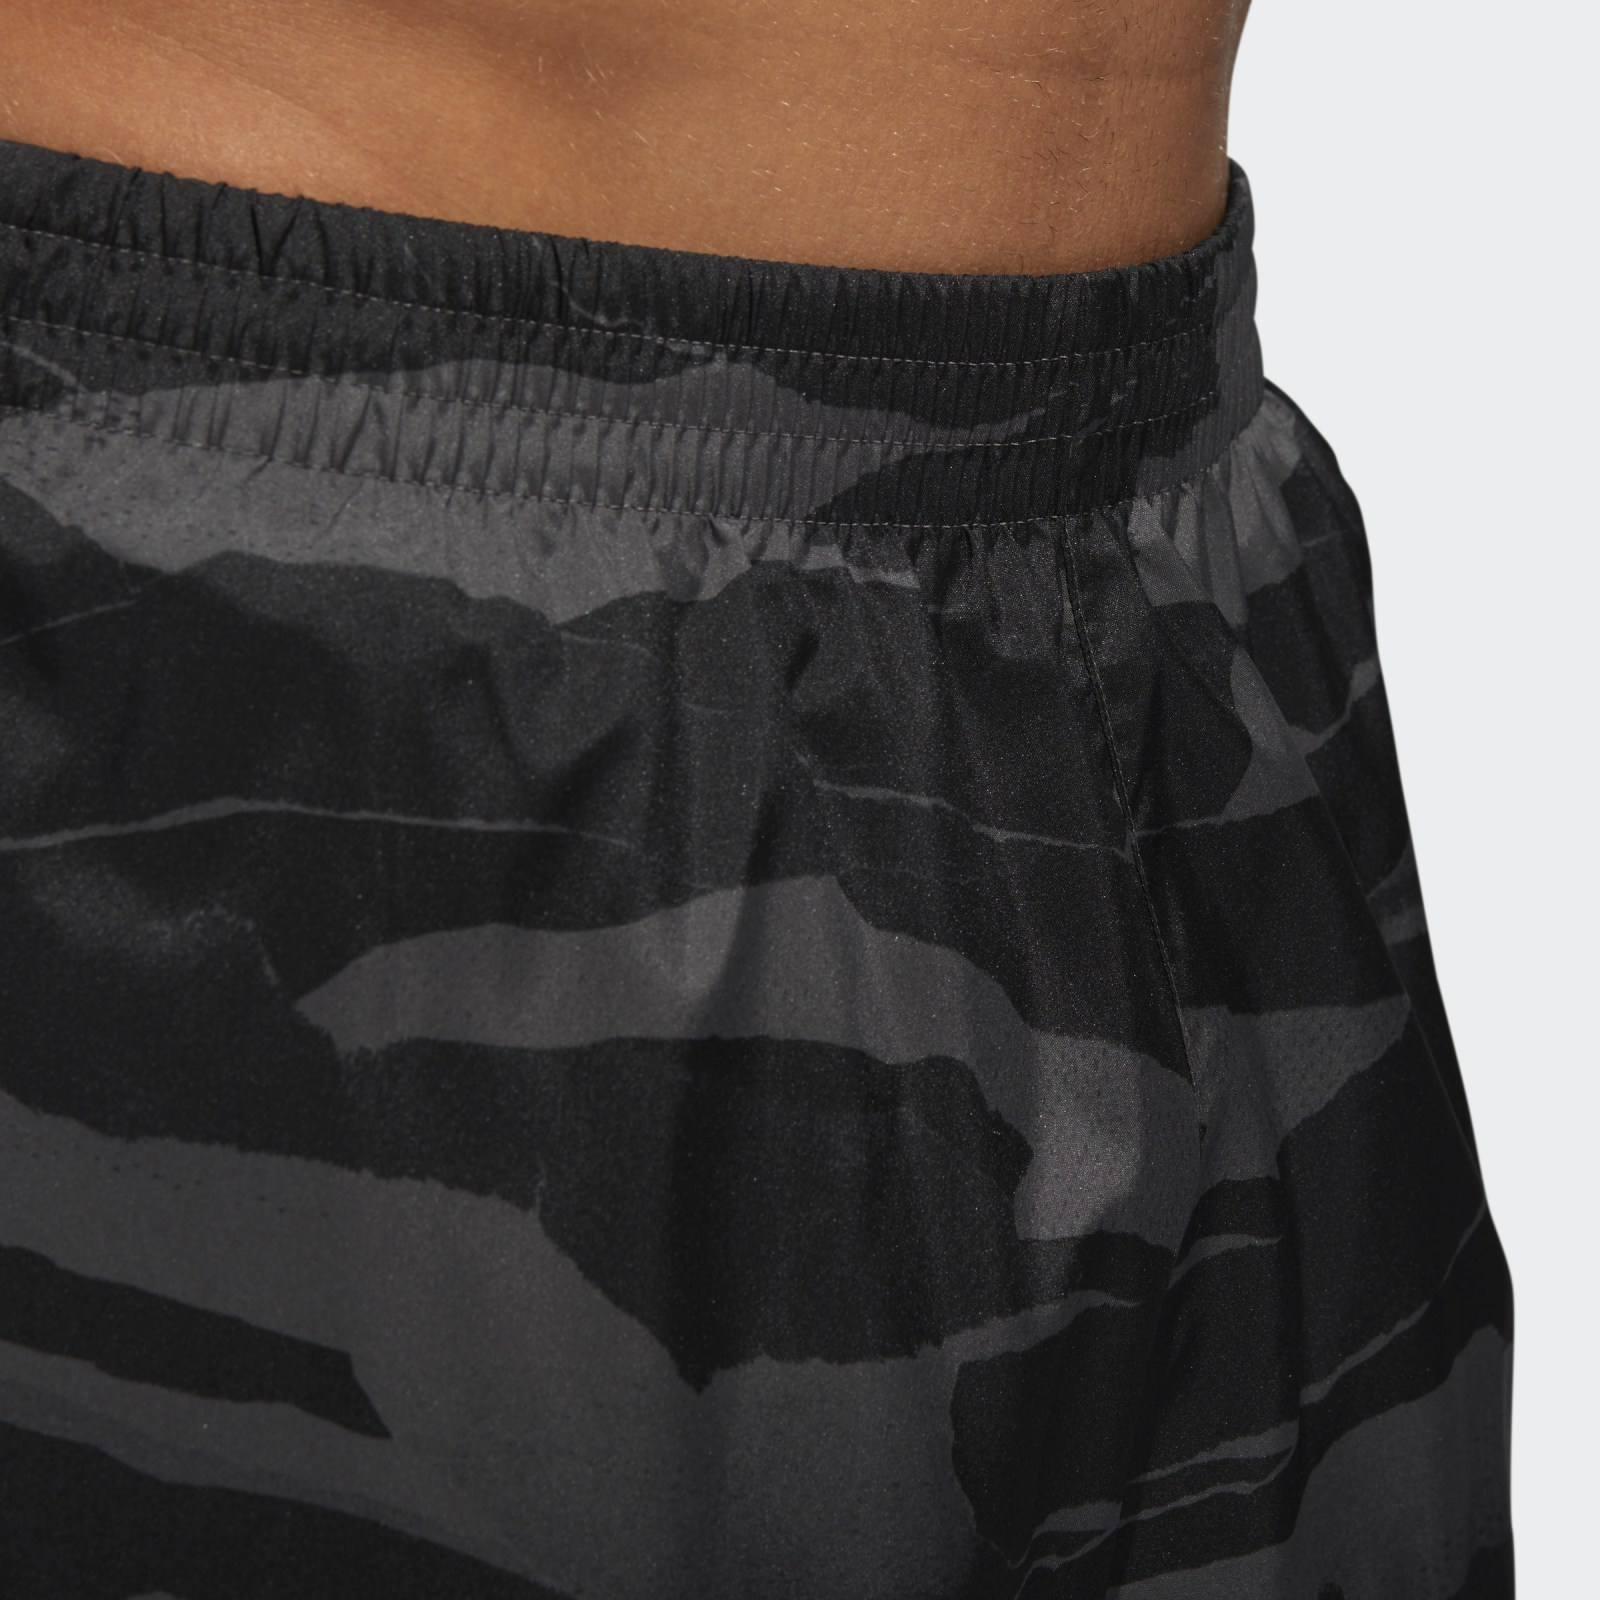 adidas Run-It Shorts Camouflage Laufhose Laufshorts Herren Fitness DQ2562